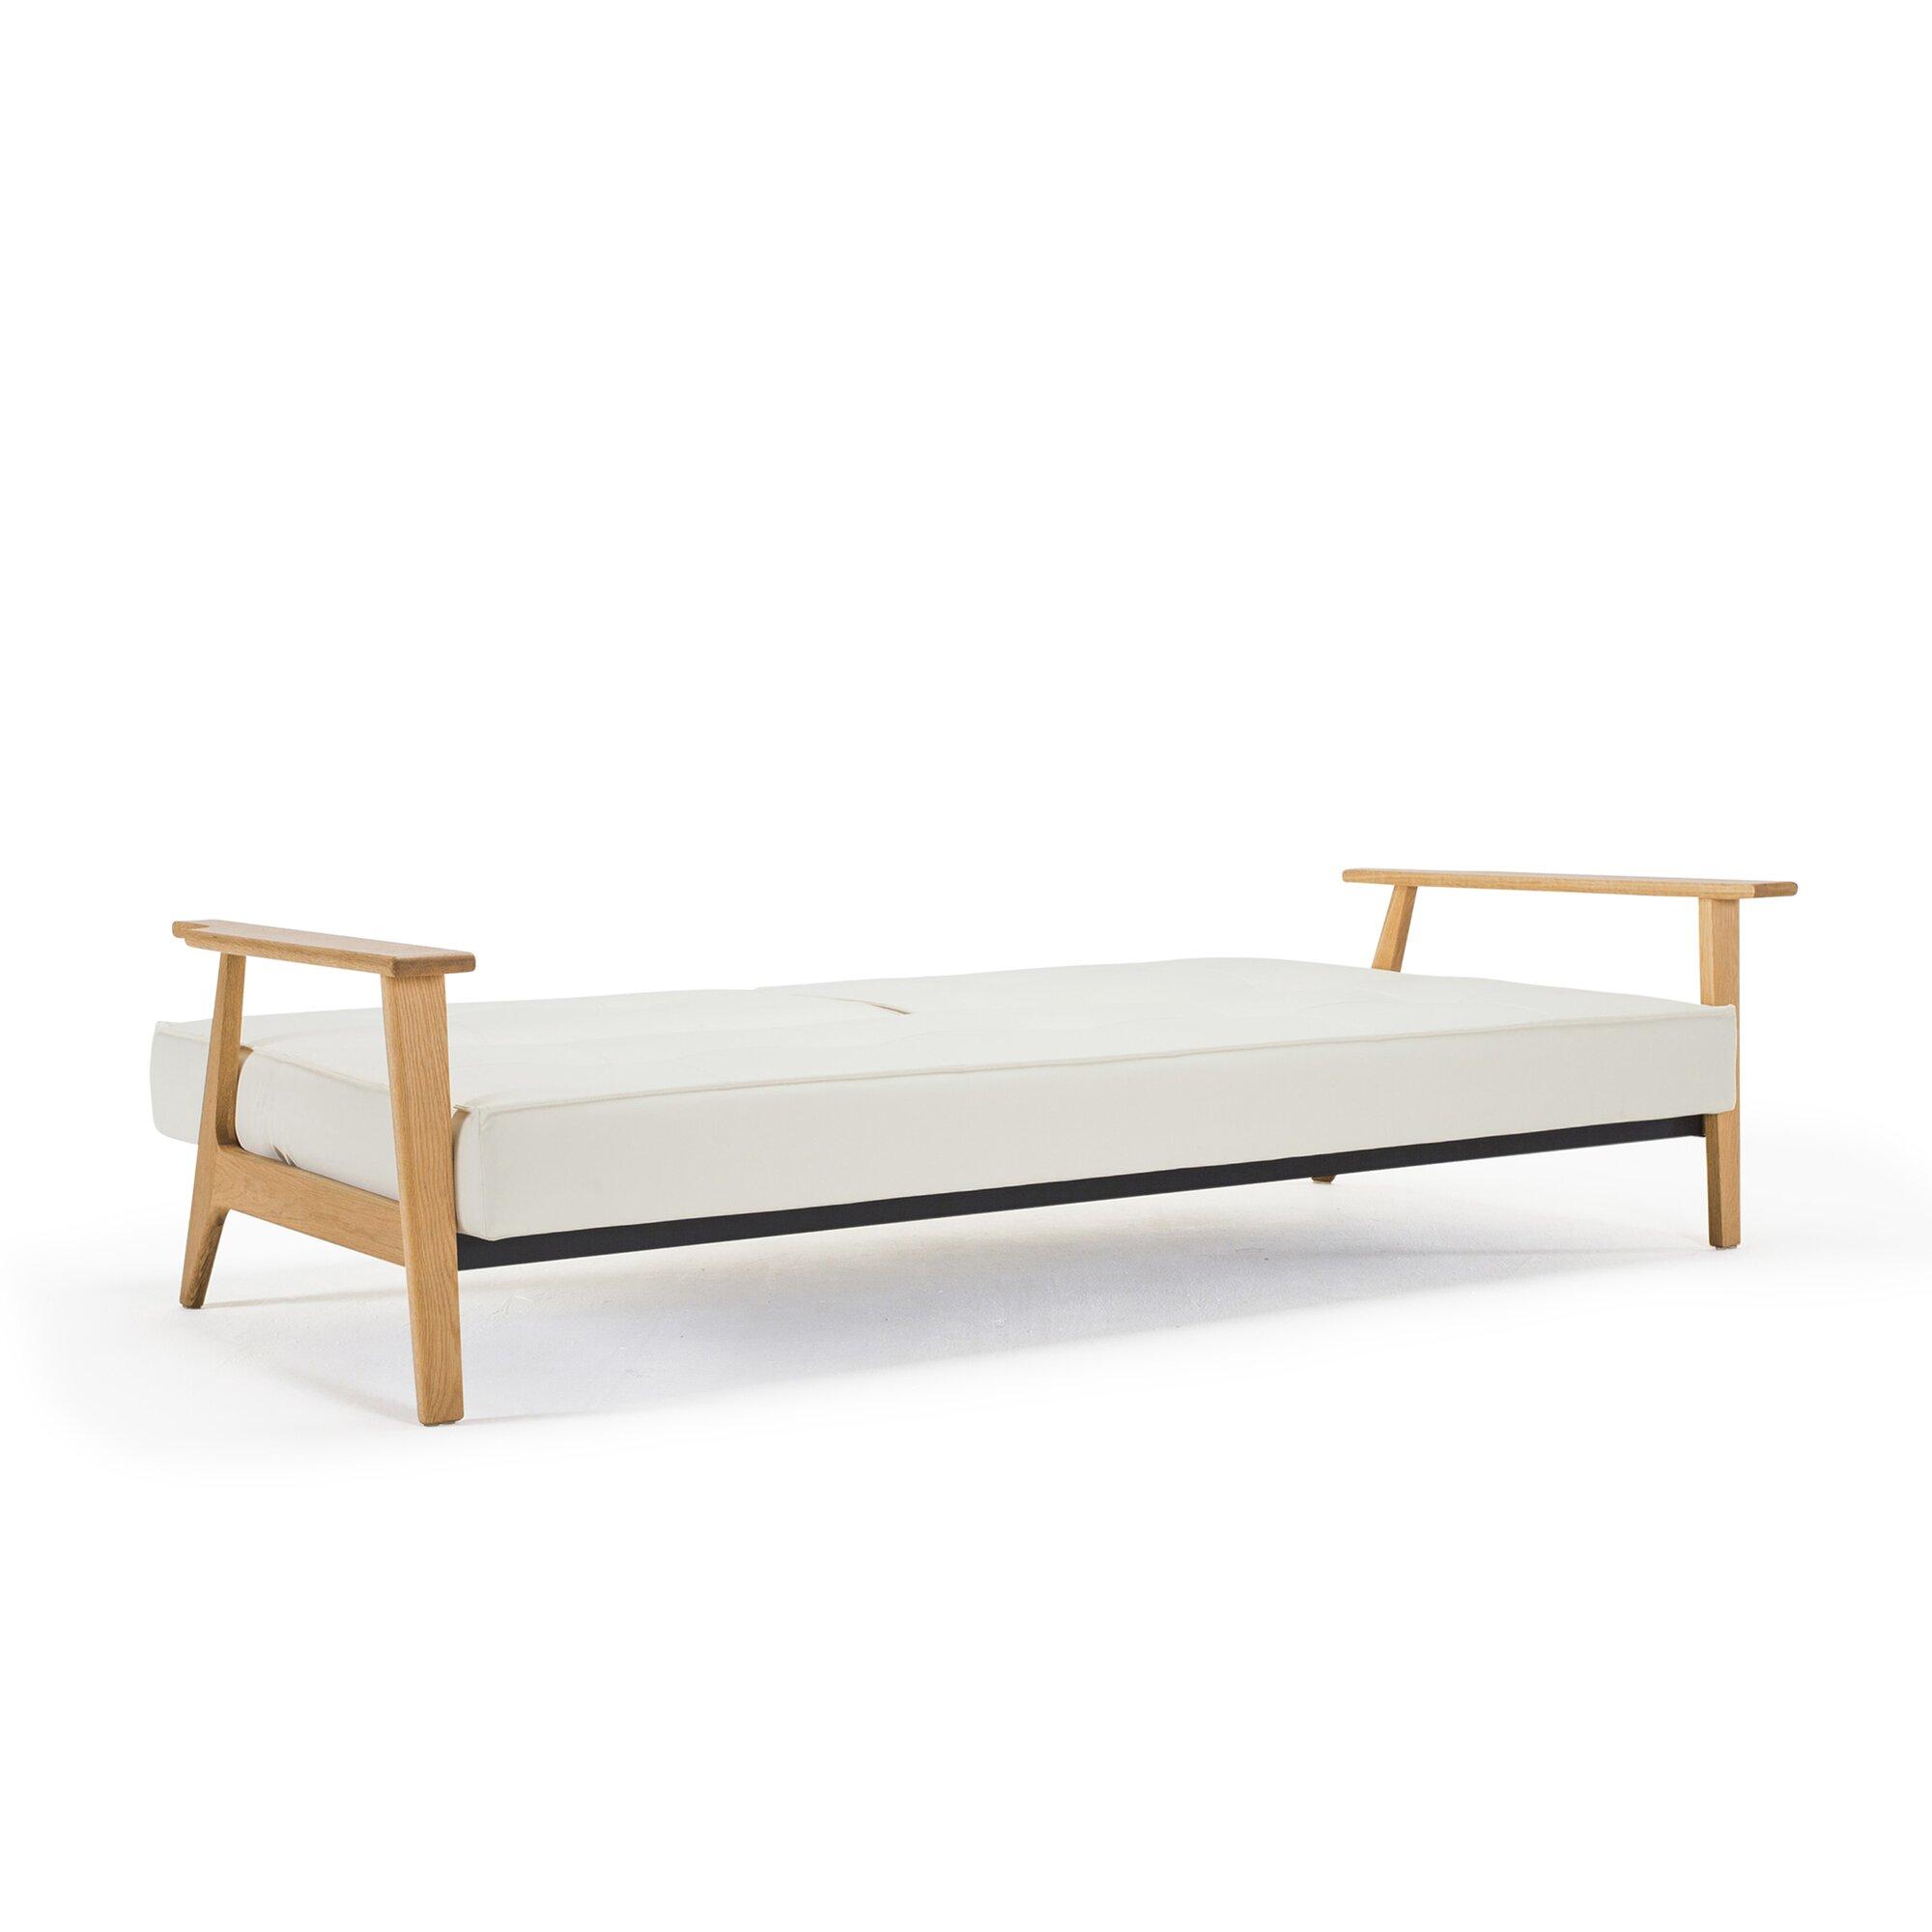 innovation 2 sitzer schlafsofa frej bewertungen. Black Bedroom Furniture Sets. Home Design Ideas